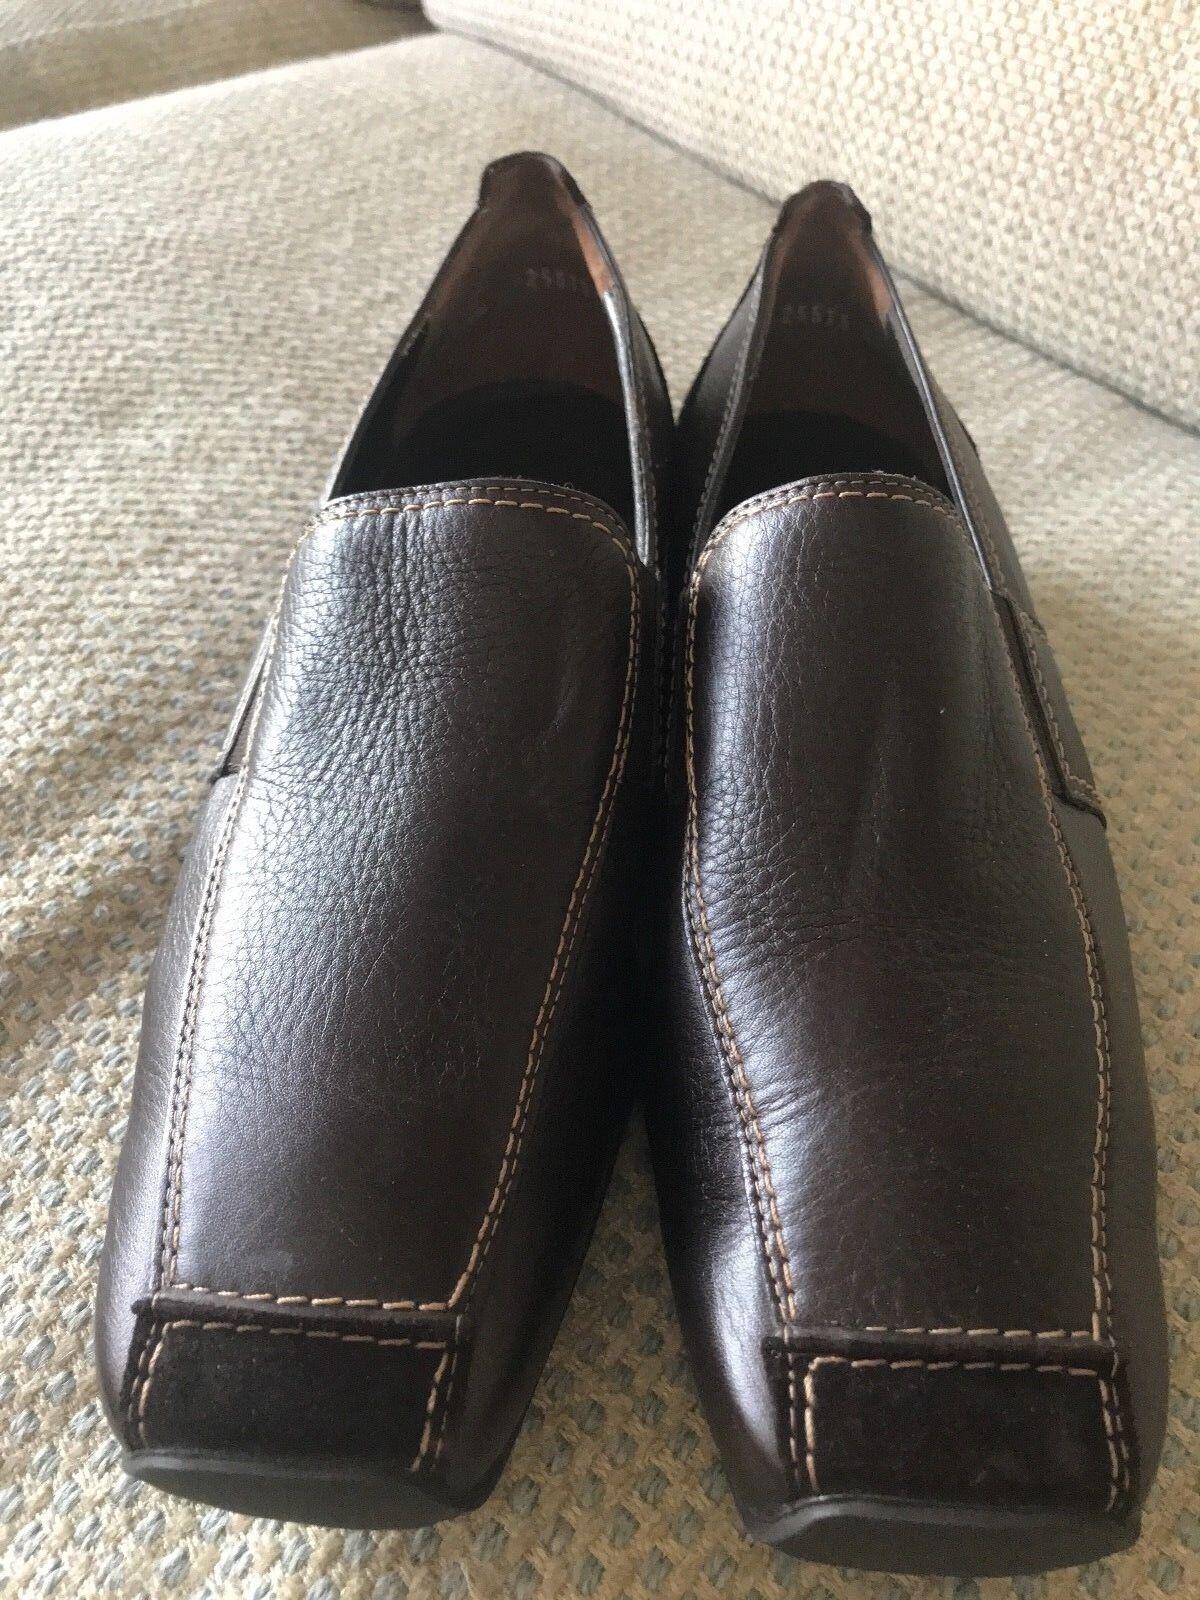 NEW PAUL Grün braun Leather Suede Low Heel Loafers 4 1 2 UK   7 US Austria